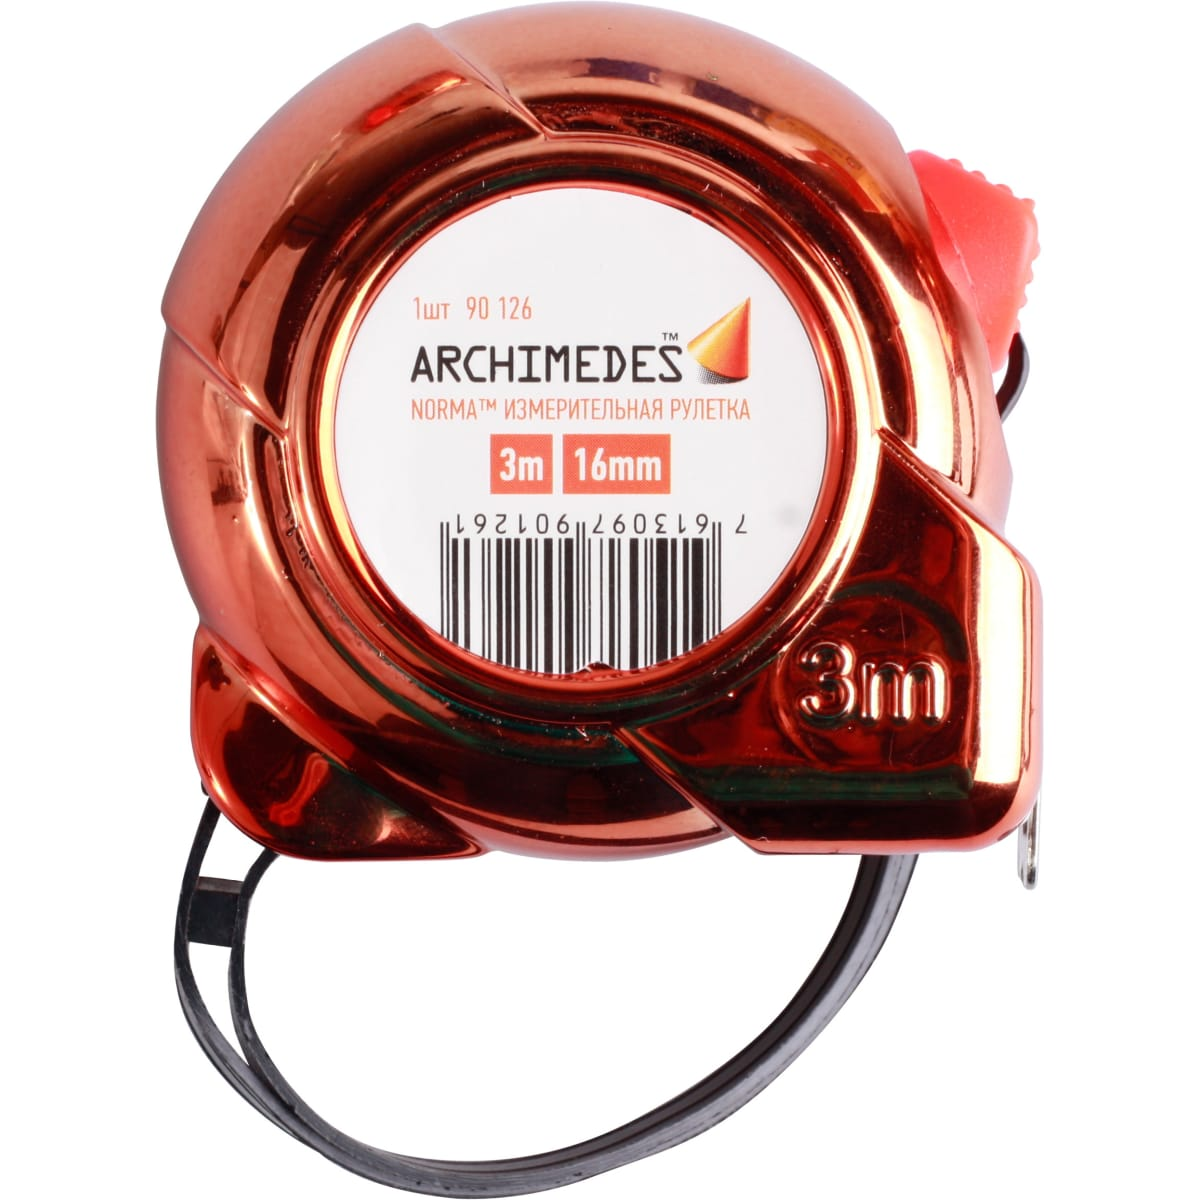 Рулетка ARCHIMEDES 3м 90126